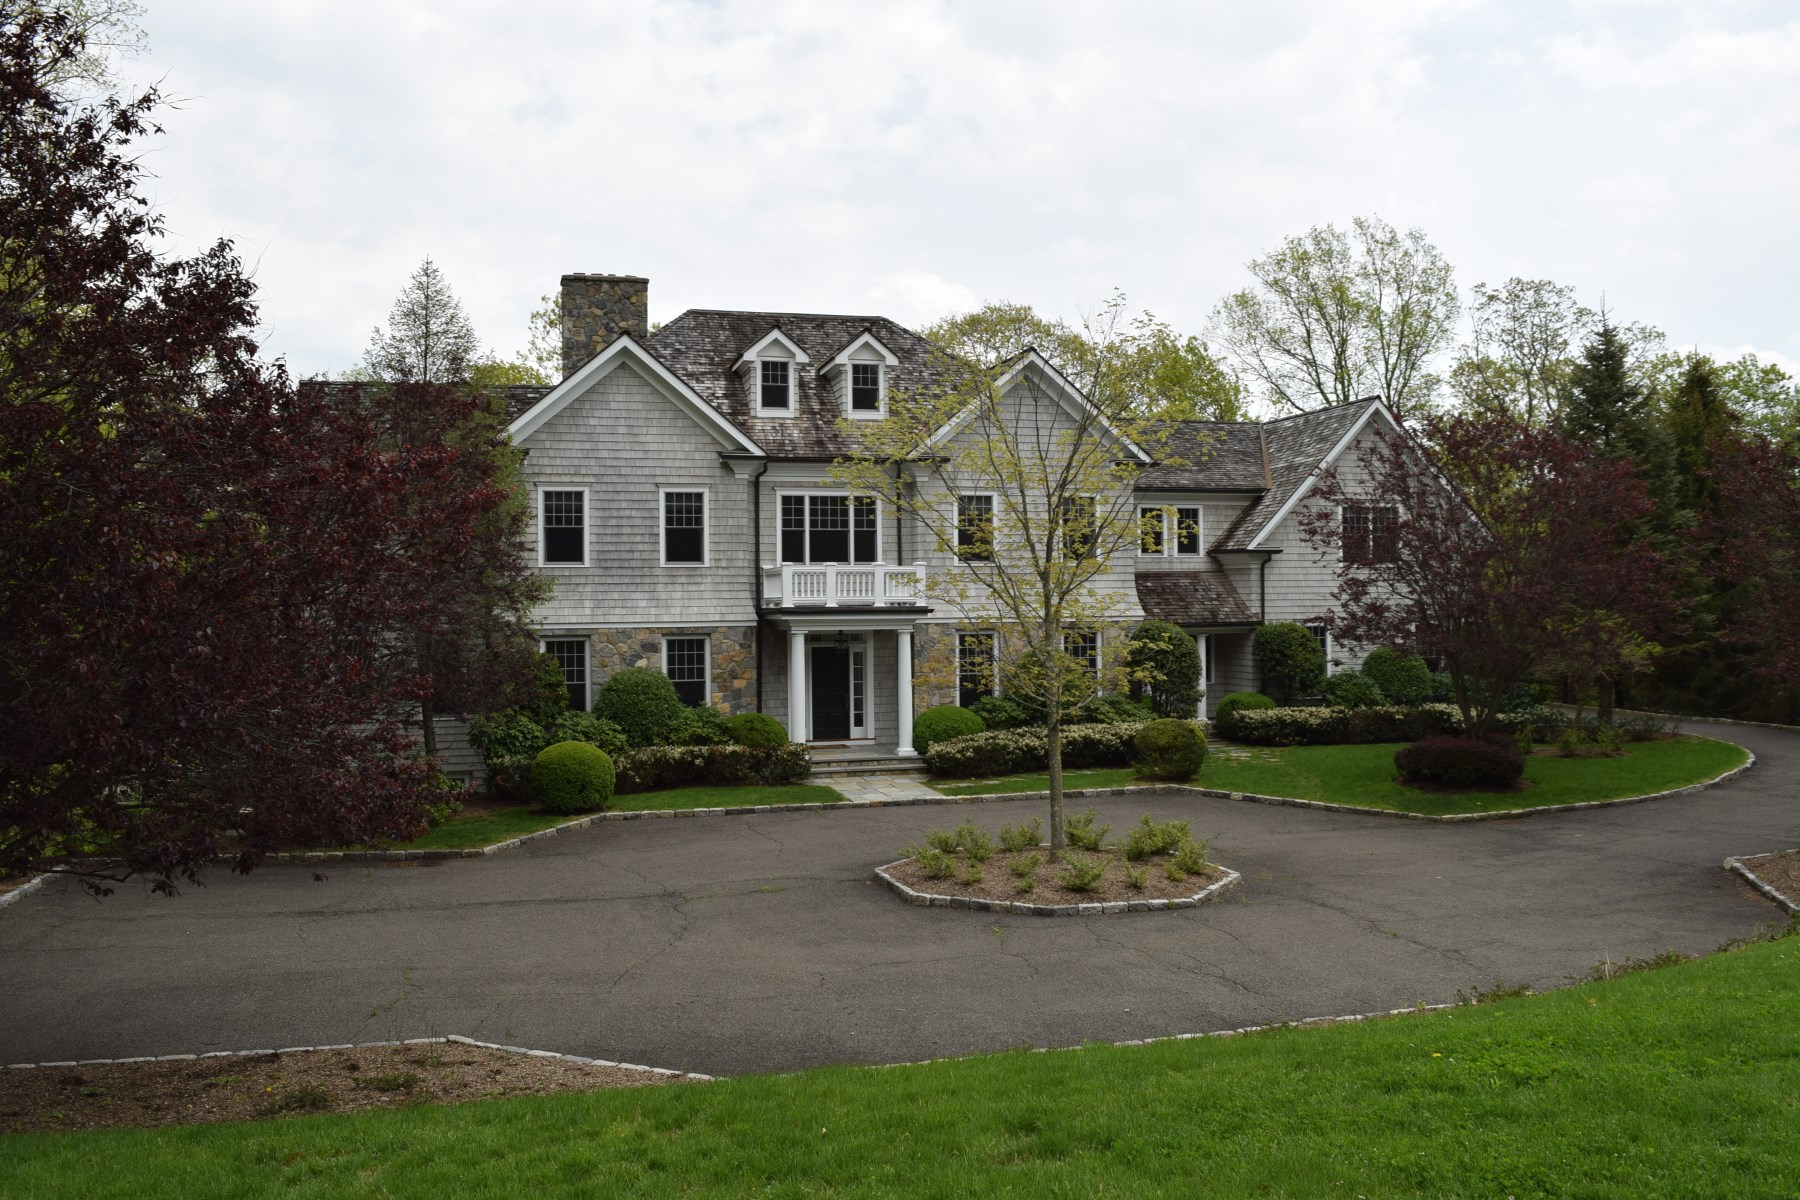 Casa para uma família para Venda às Mid-Country Serenity 19 Desiree Drive Mid-Country, Greenwich, Connecticut, 06830 Estados Unidos